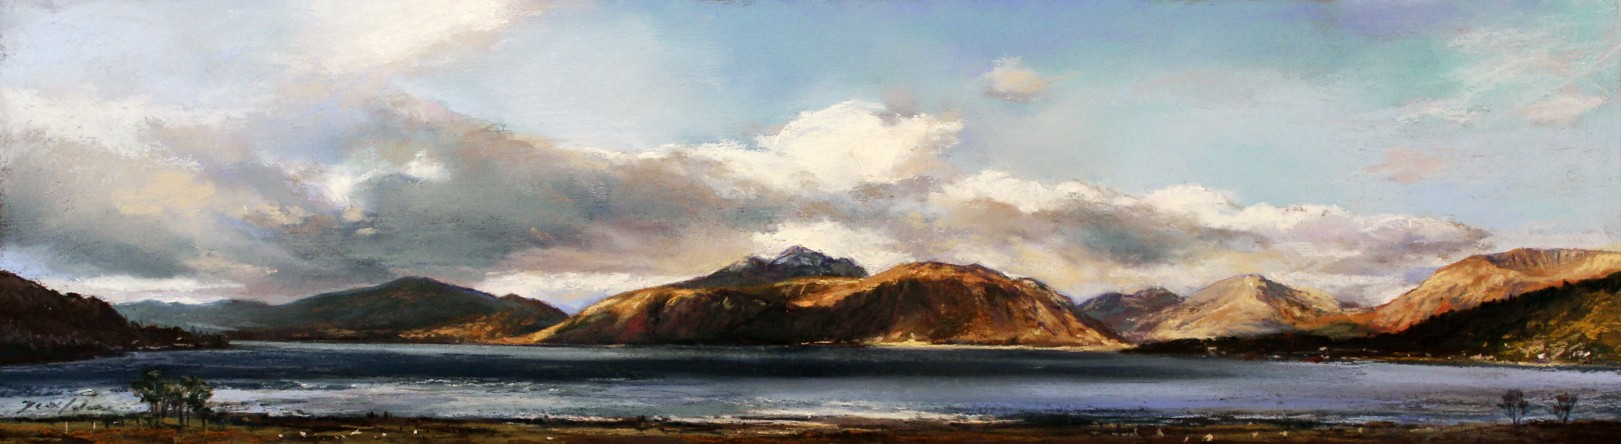 21_Fiona Haldane_The Shores OF Ballahulish_Pastel_6x21